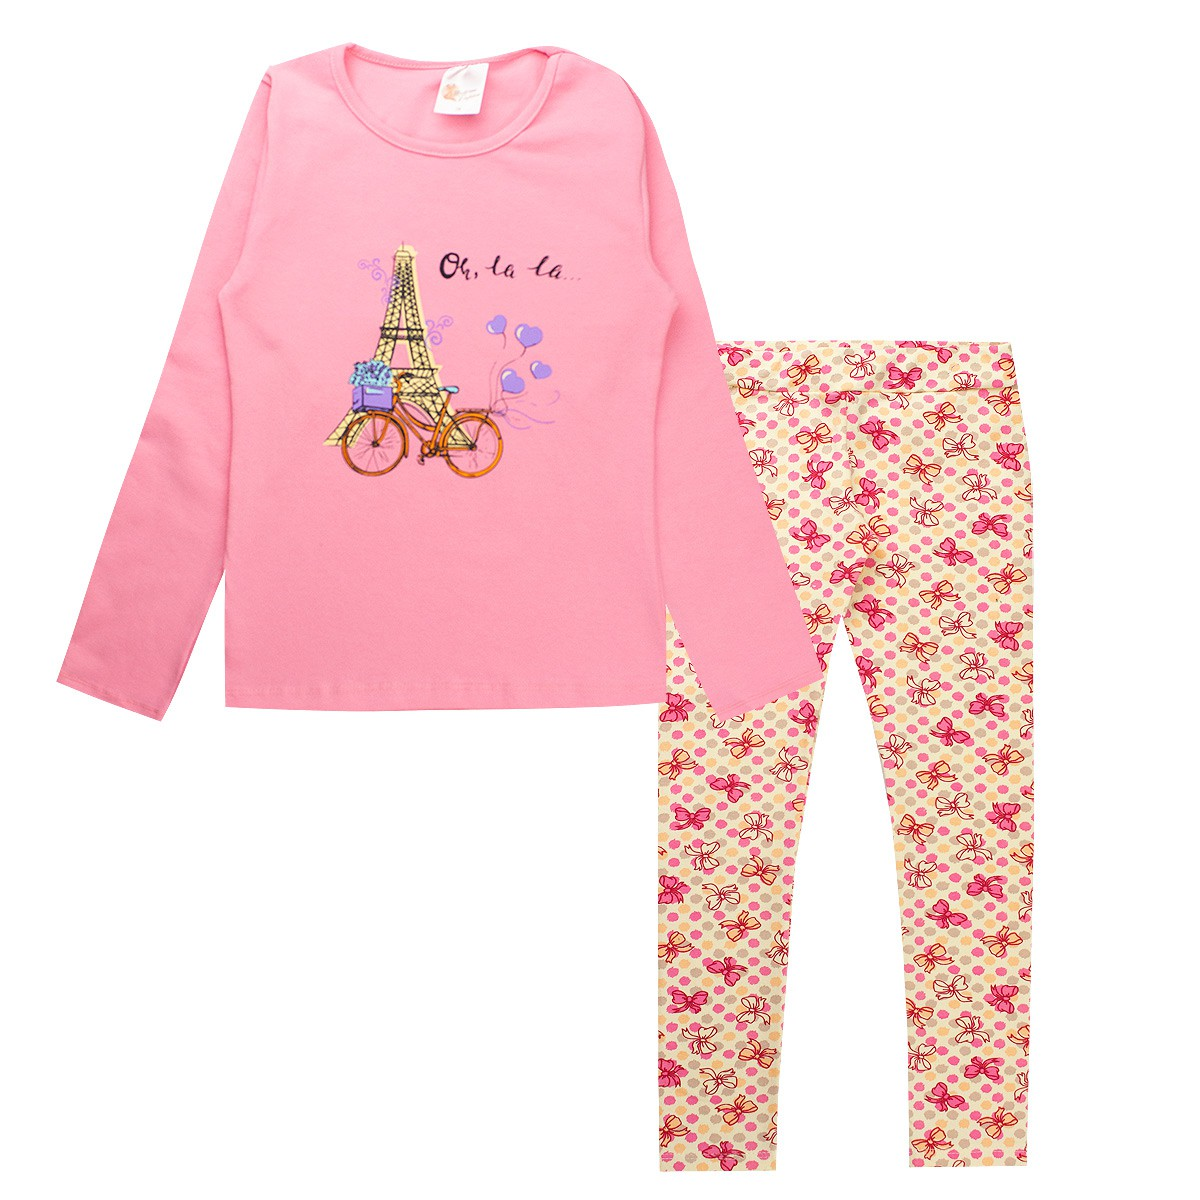 Conjunto Infantil Menina Torre Eiffel Cotton Rosa Promoção